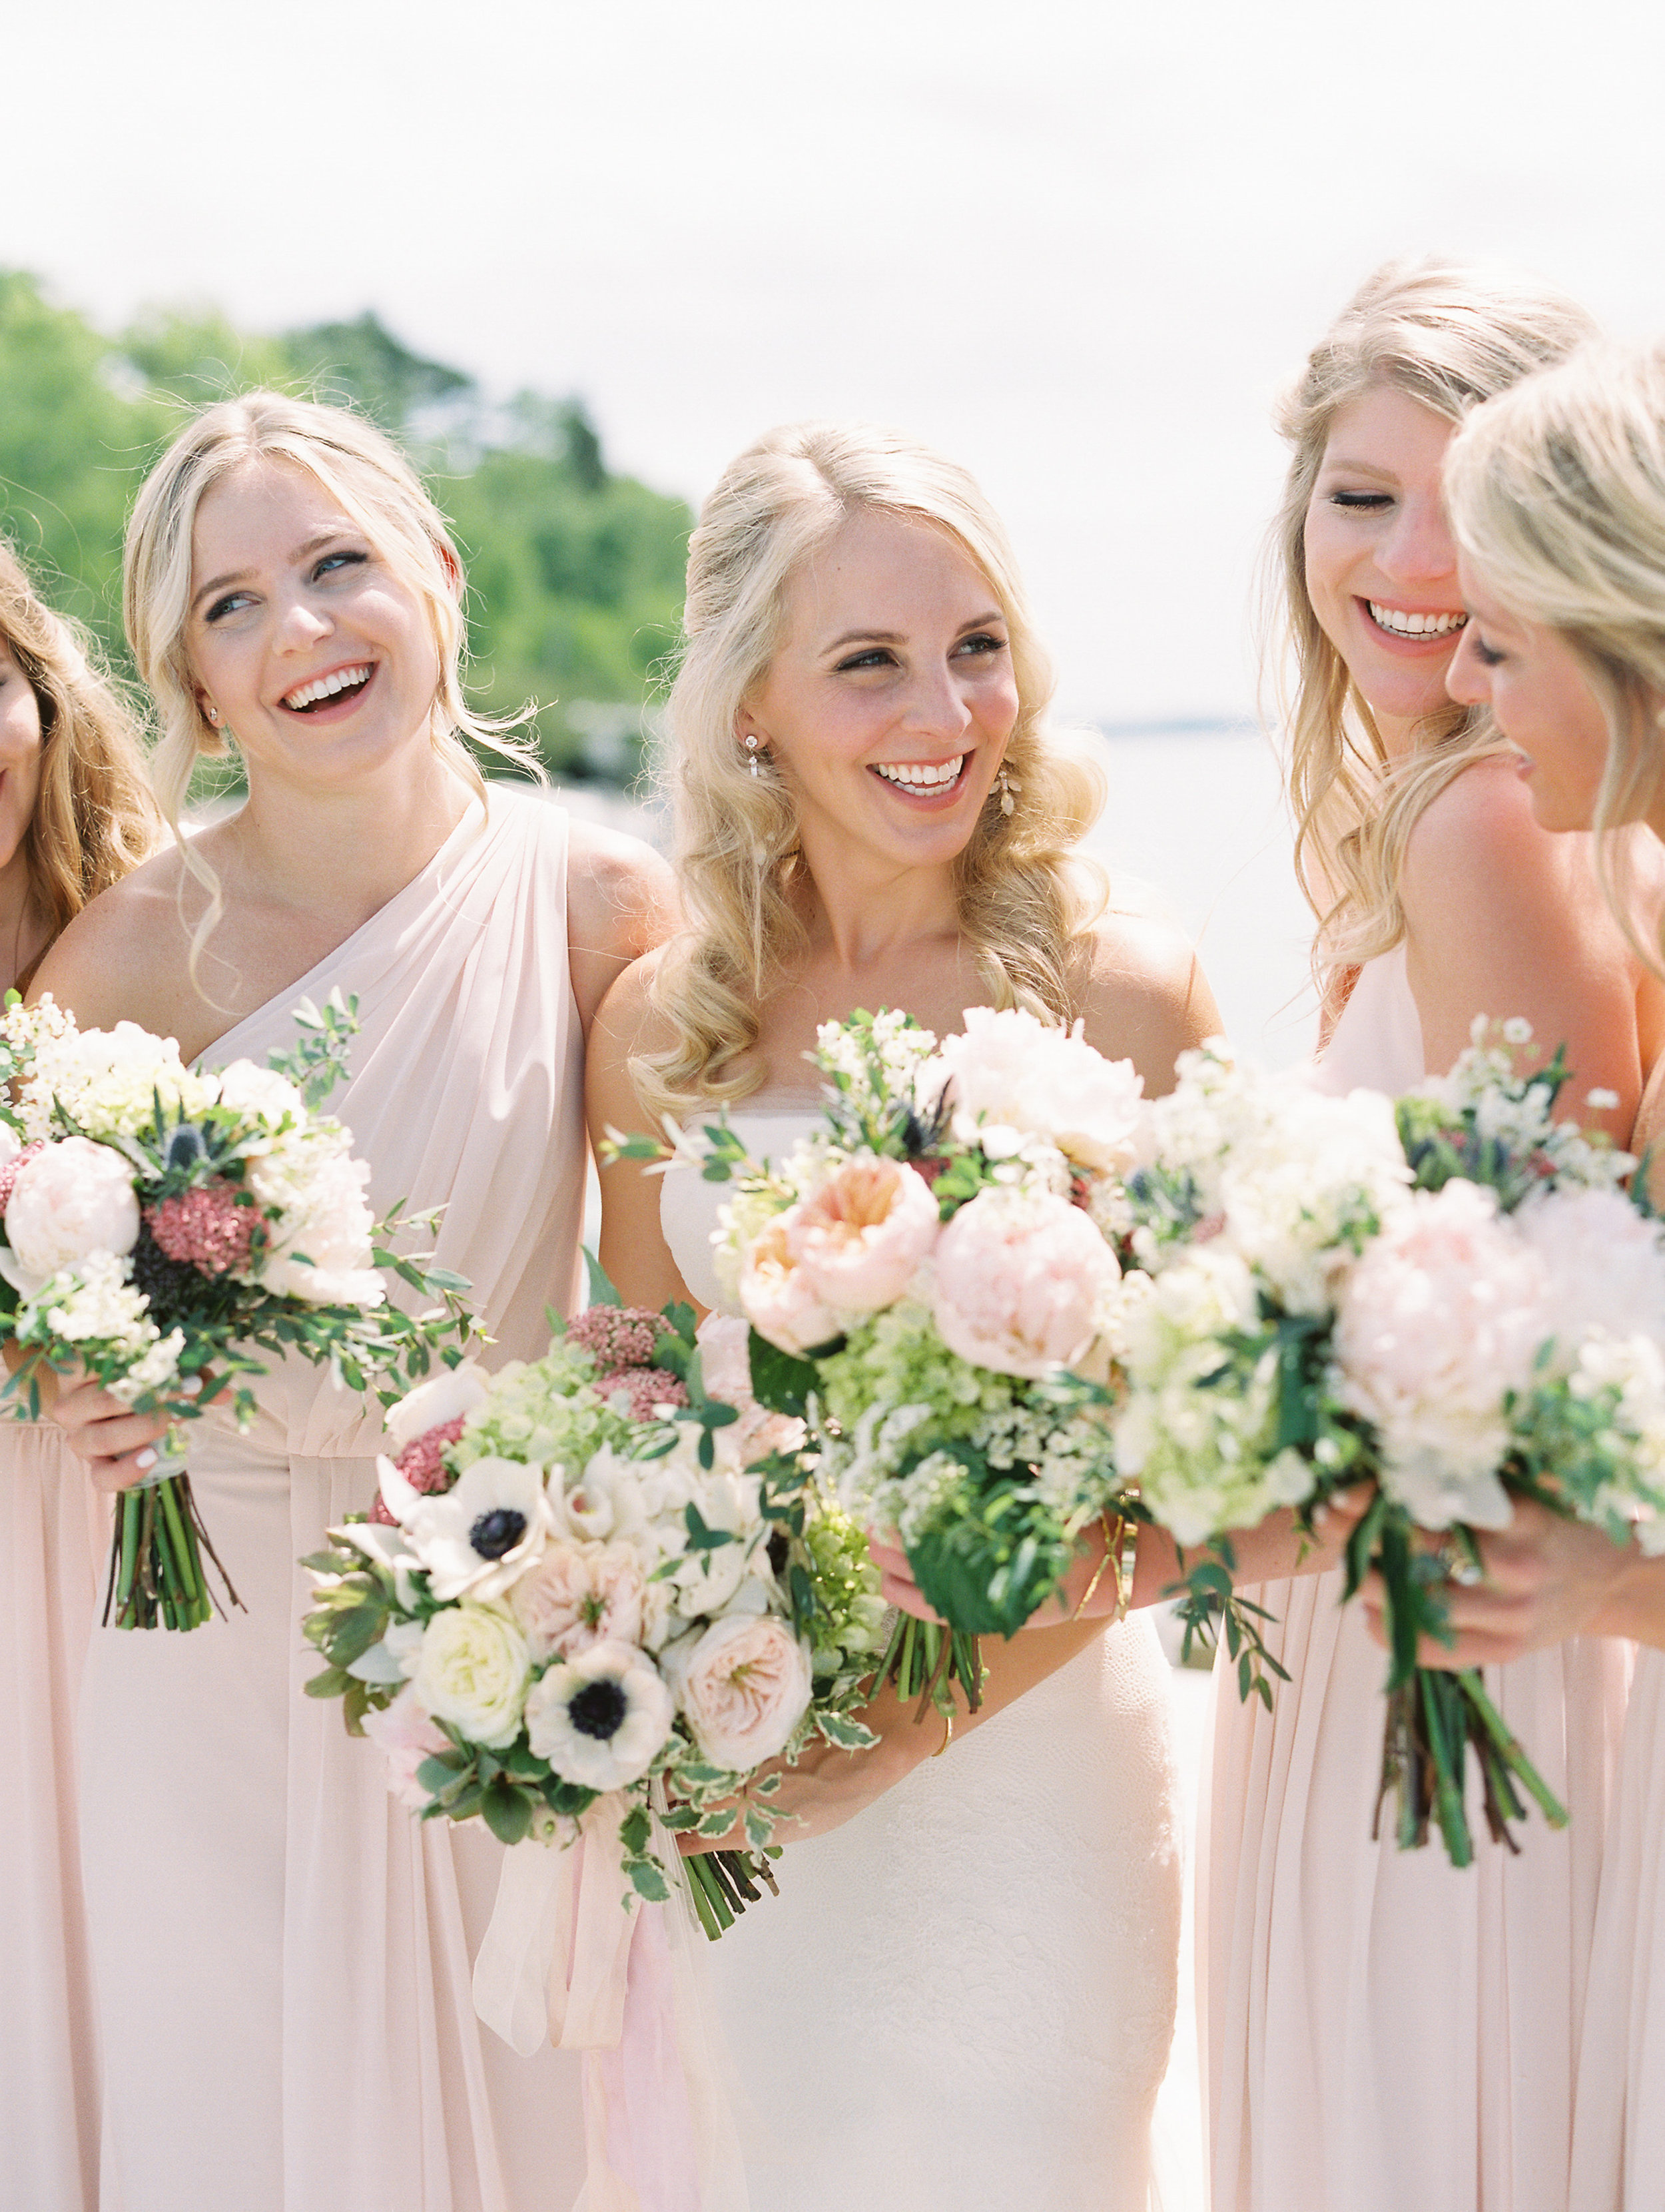 Coffman+Wedding+Bridal+Party-4.jpg